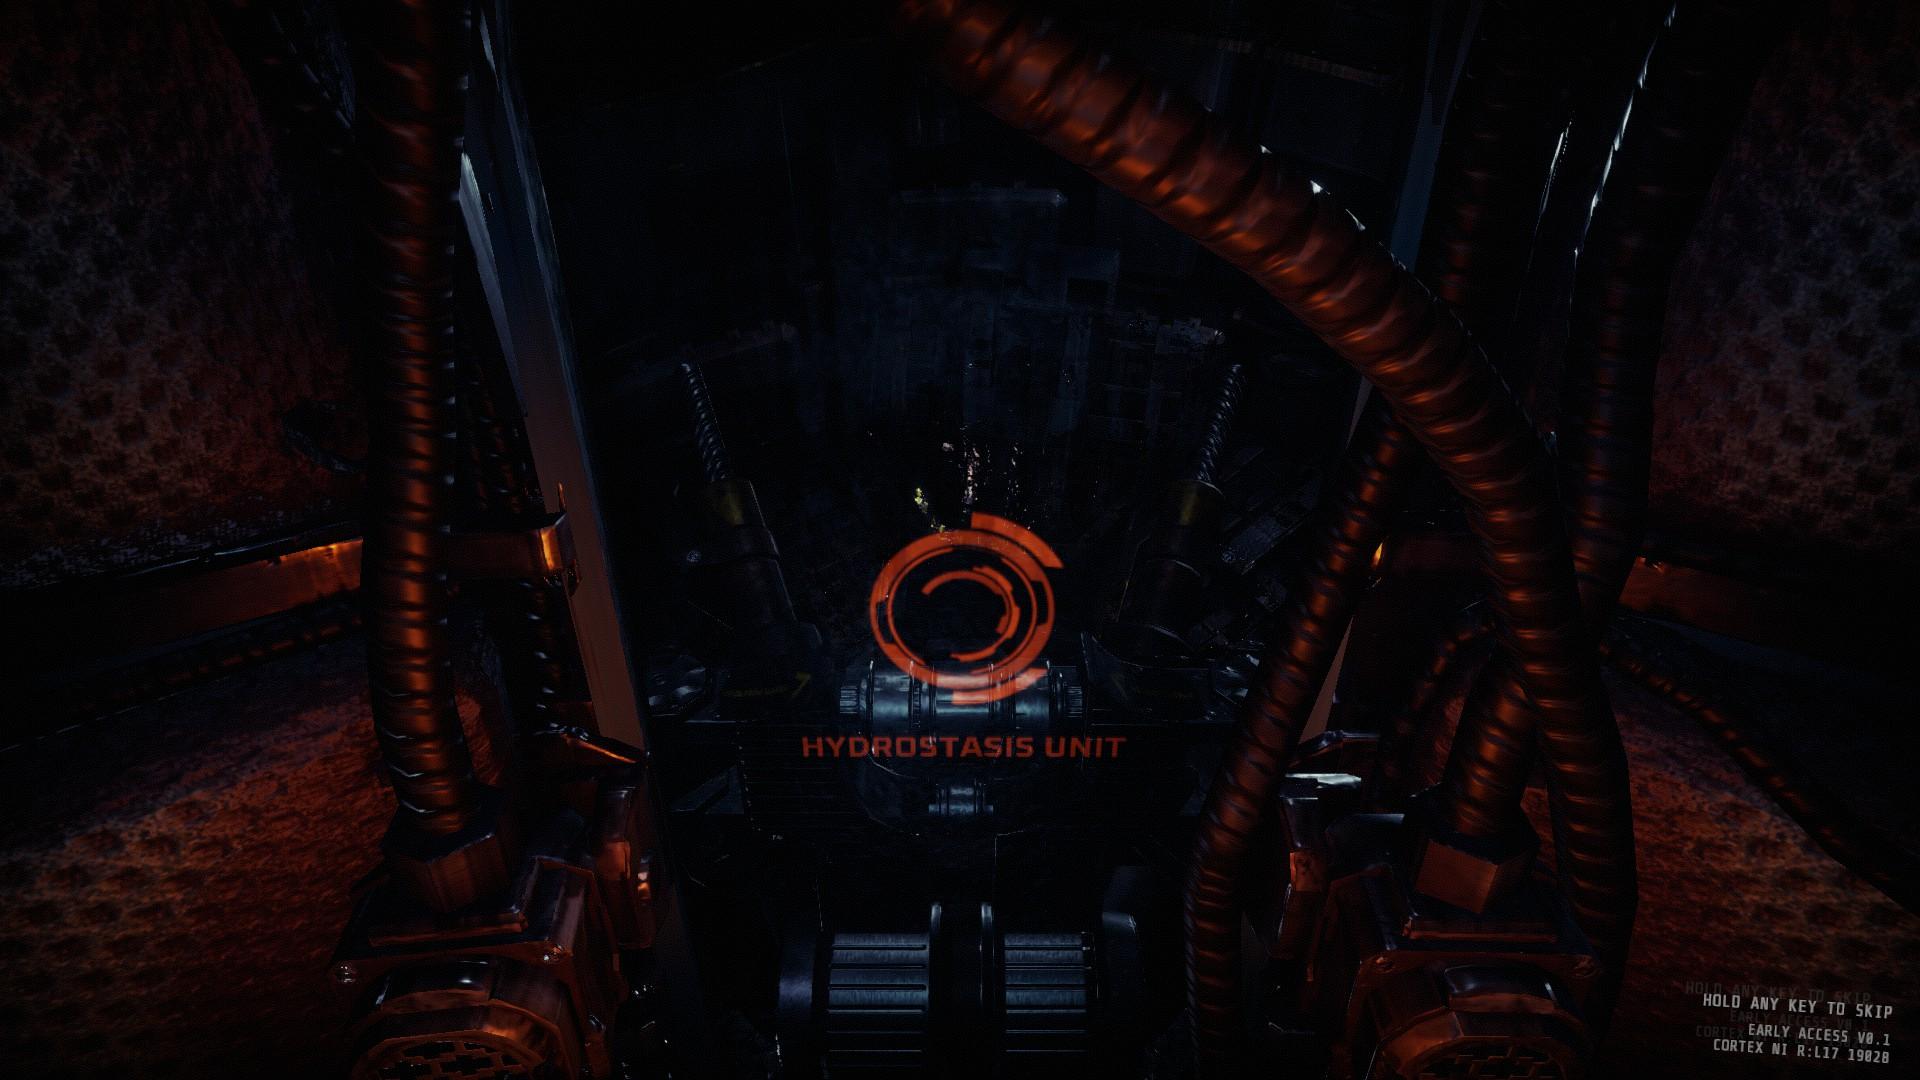 [PCゲーム]GTFO早期アクセス、そうだ、地下施設を調べにいこう。2